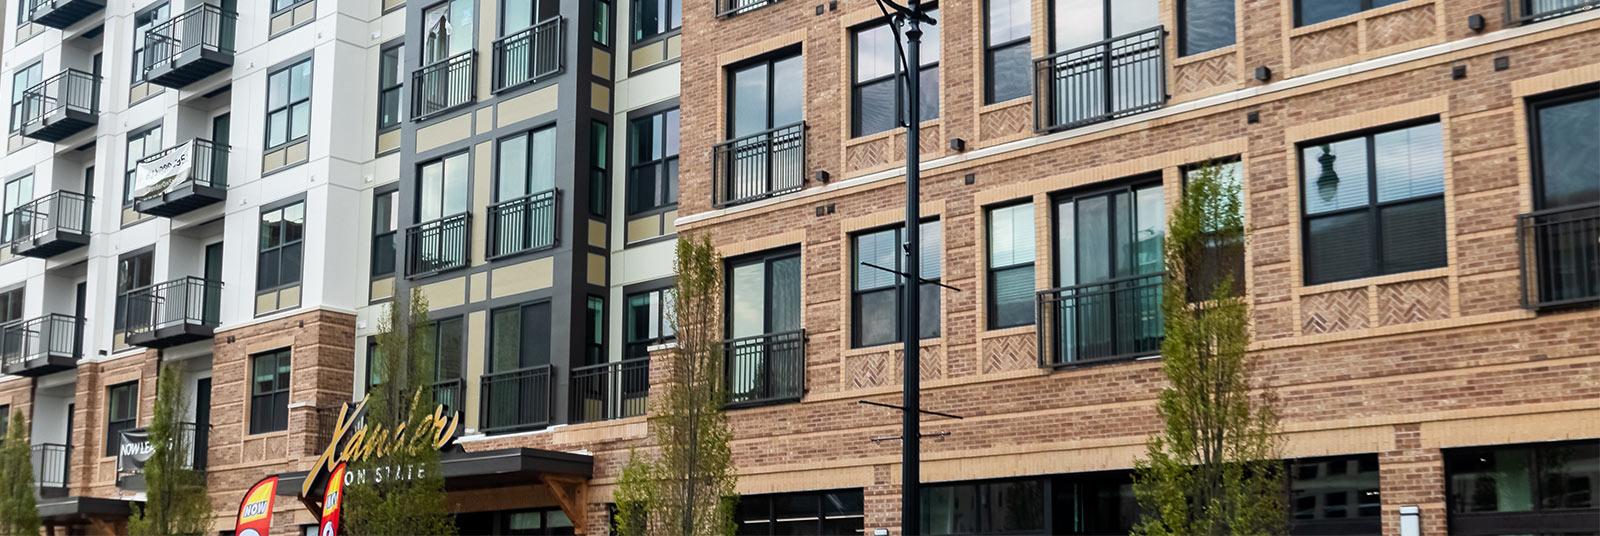 Xander on State multi-family housing development in Columbus, Ohio.